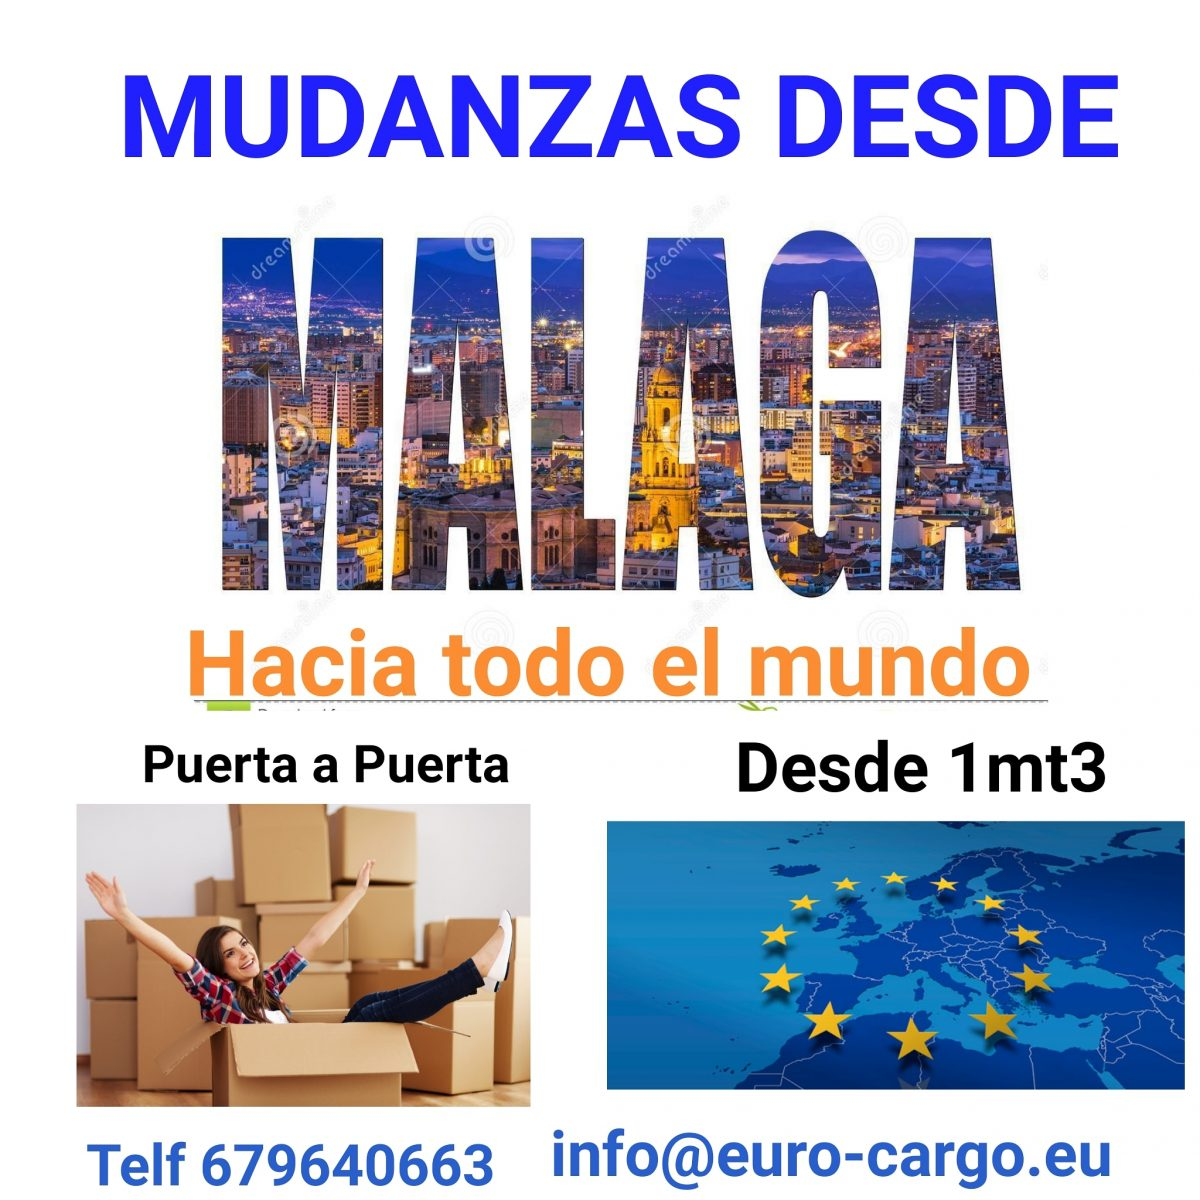 IMG_20190524_185024_370-1200x1200.jpg